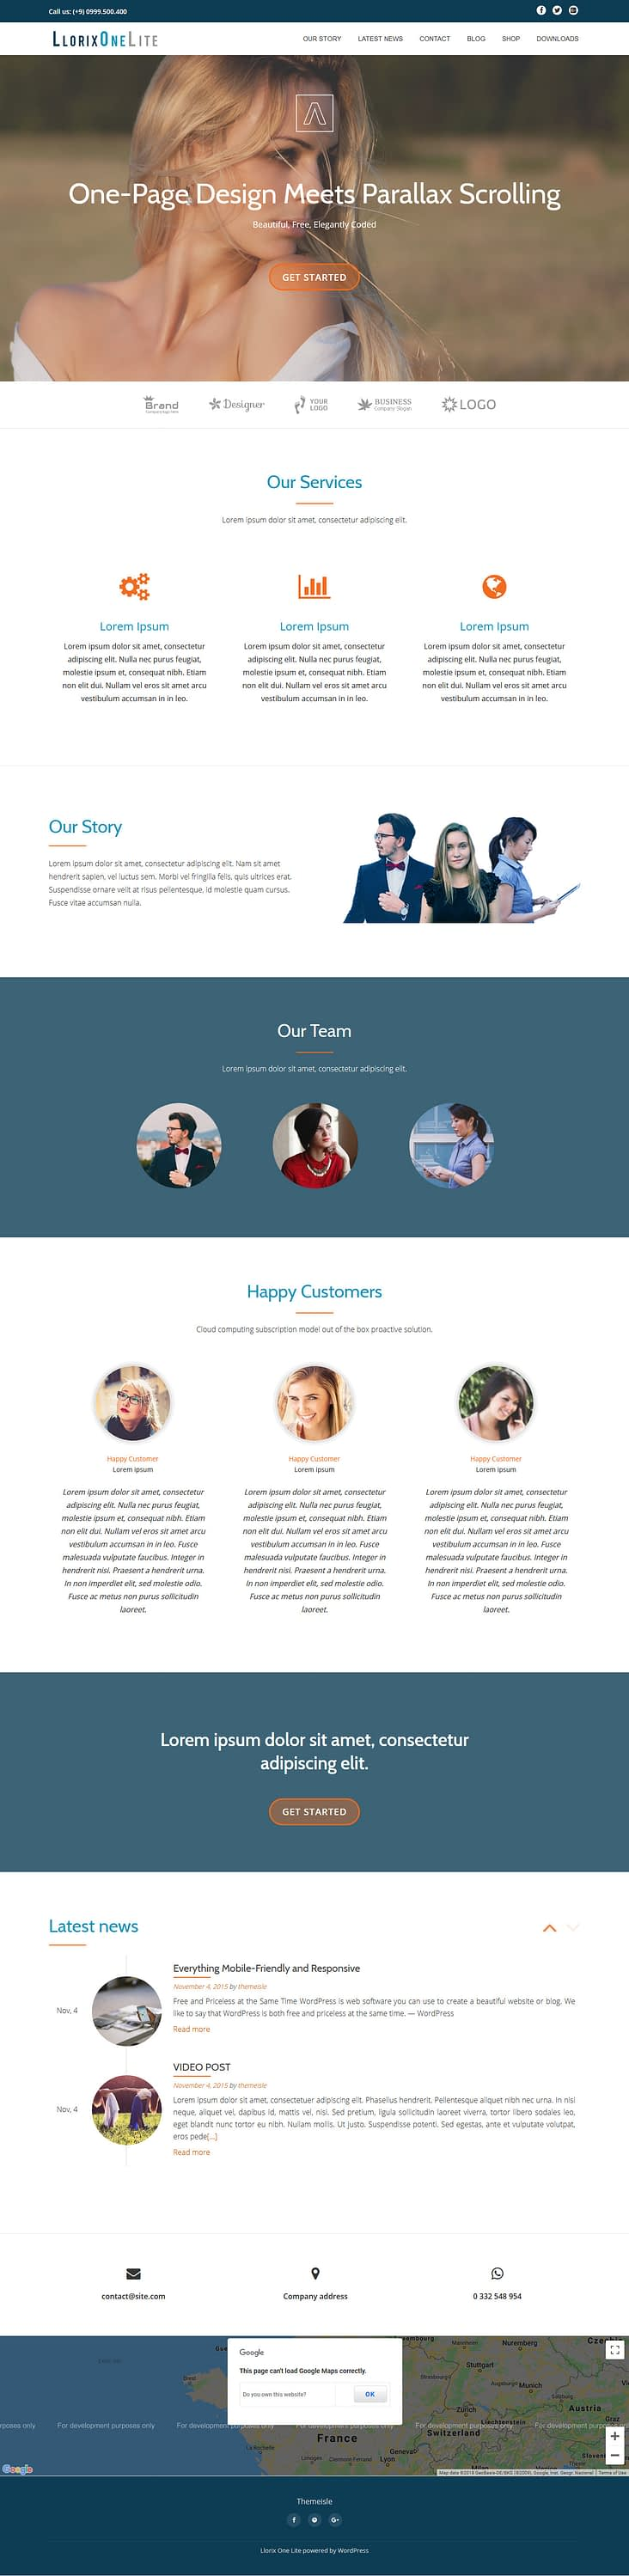 Llorix One Lite - Best Free Fullscreen WordPress The